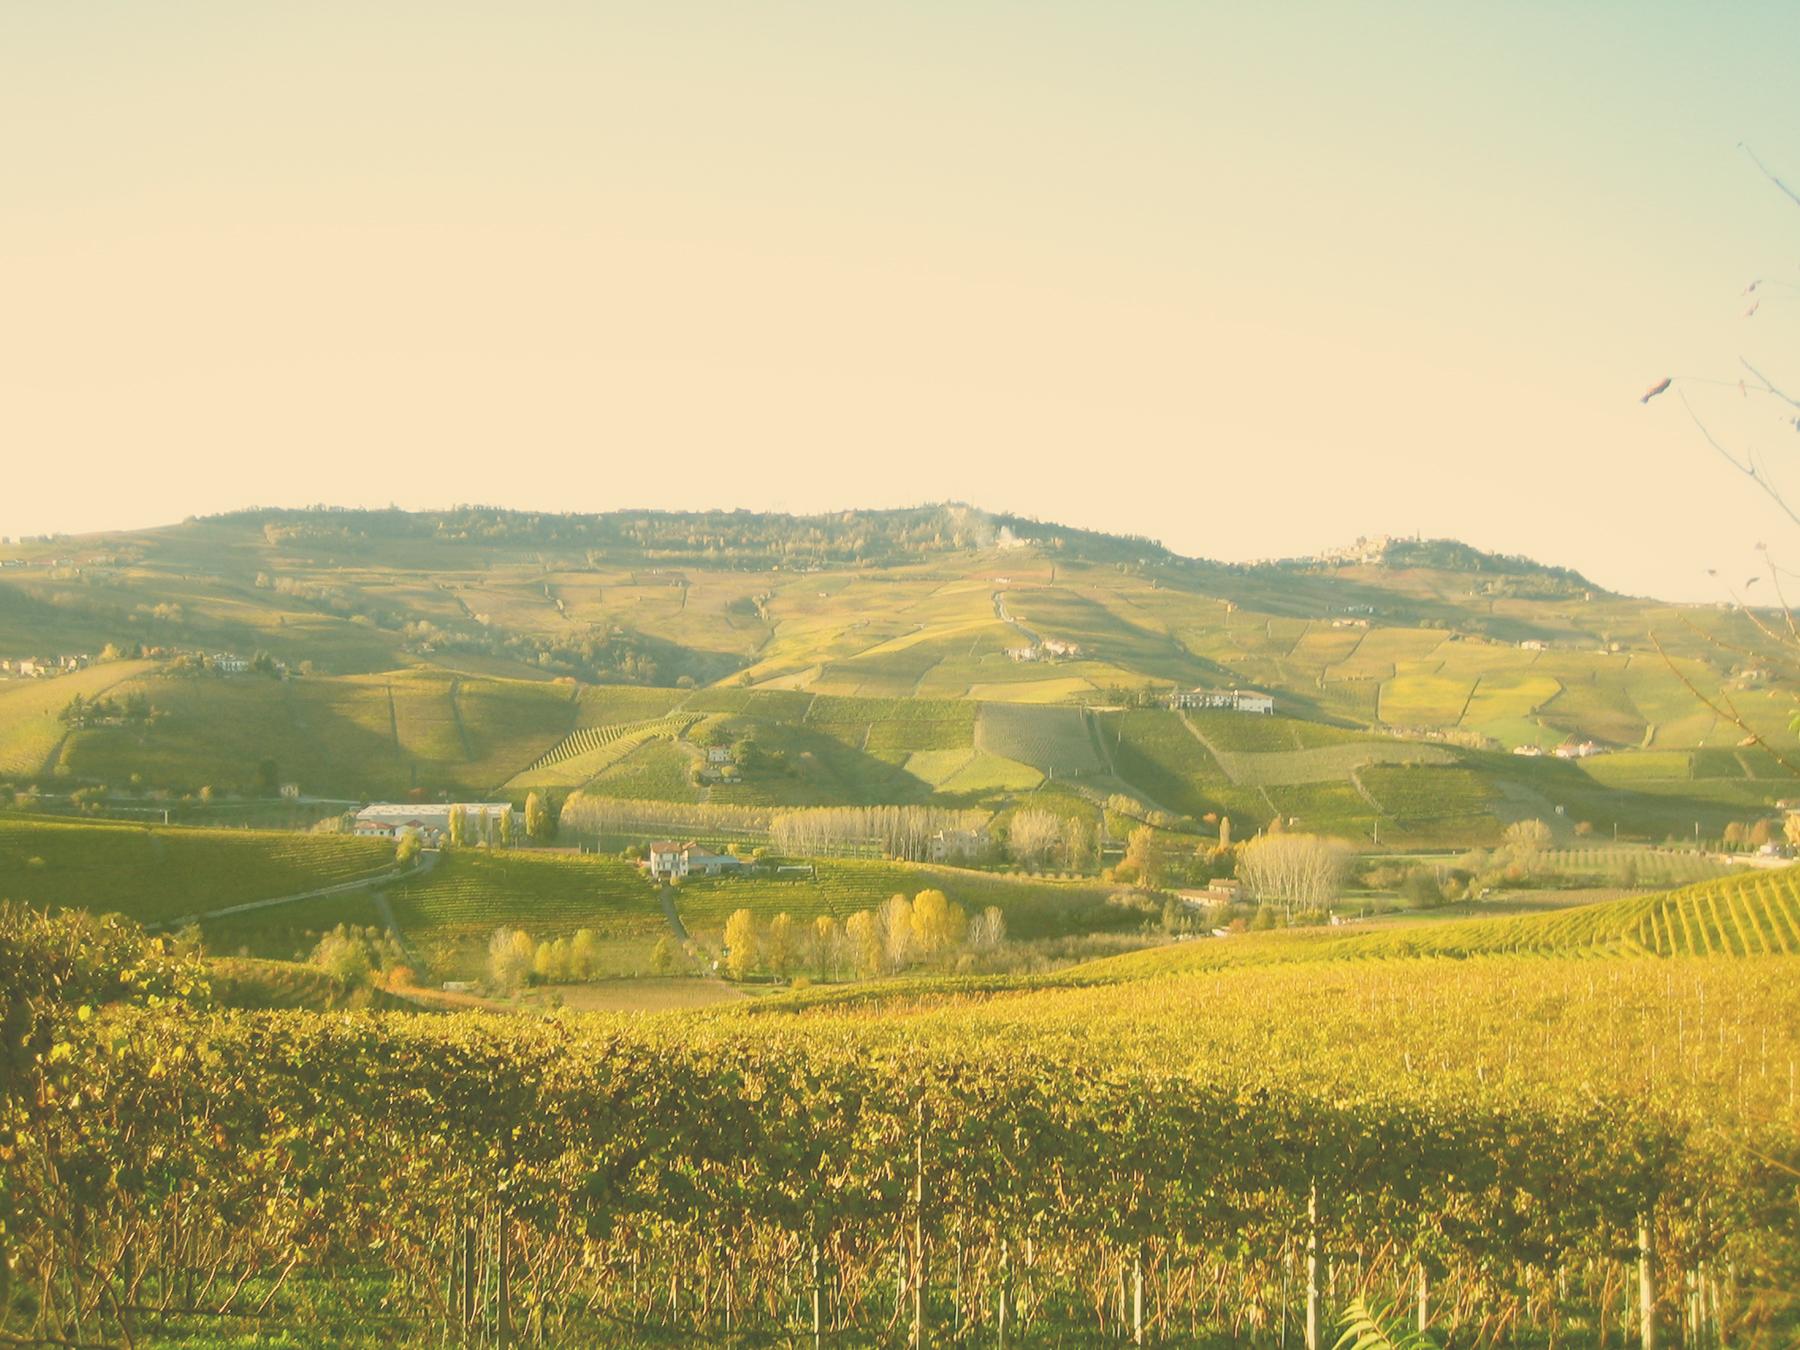 Italy; Piemonte; vineyard; winery; wine; travel